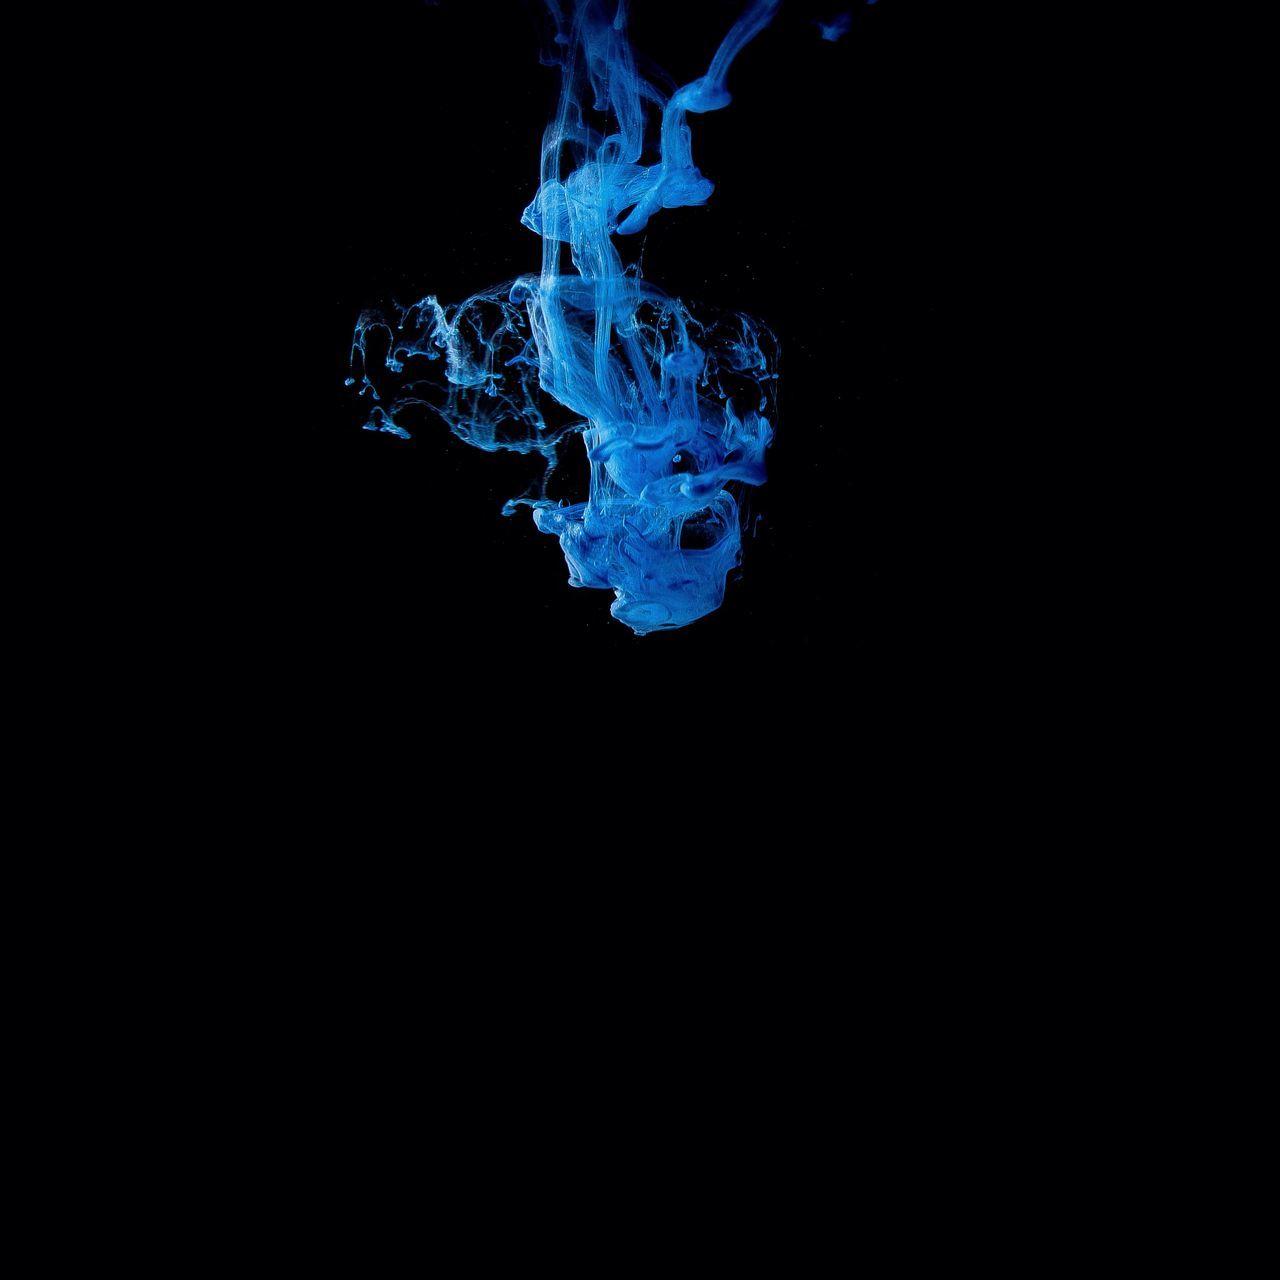 Water Abstract Ink Blue Black Background Shape Dissolving Pattern No People Splashing Studio Shot Motion Liquid Close-up Mixing Underwater Colliding